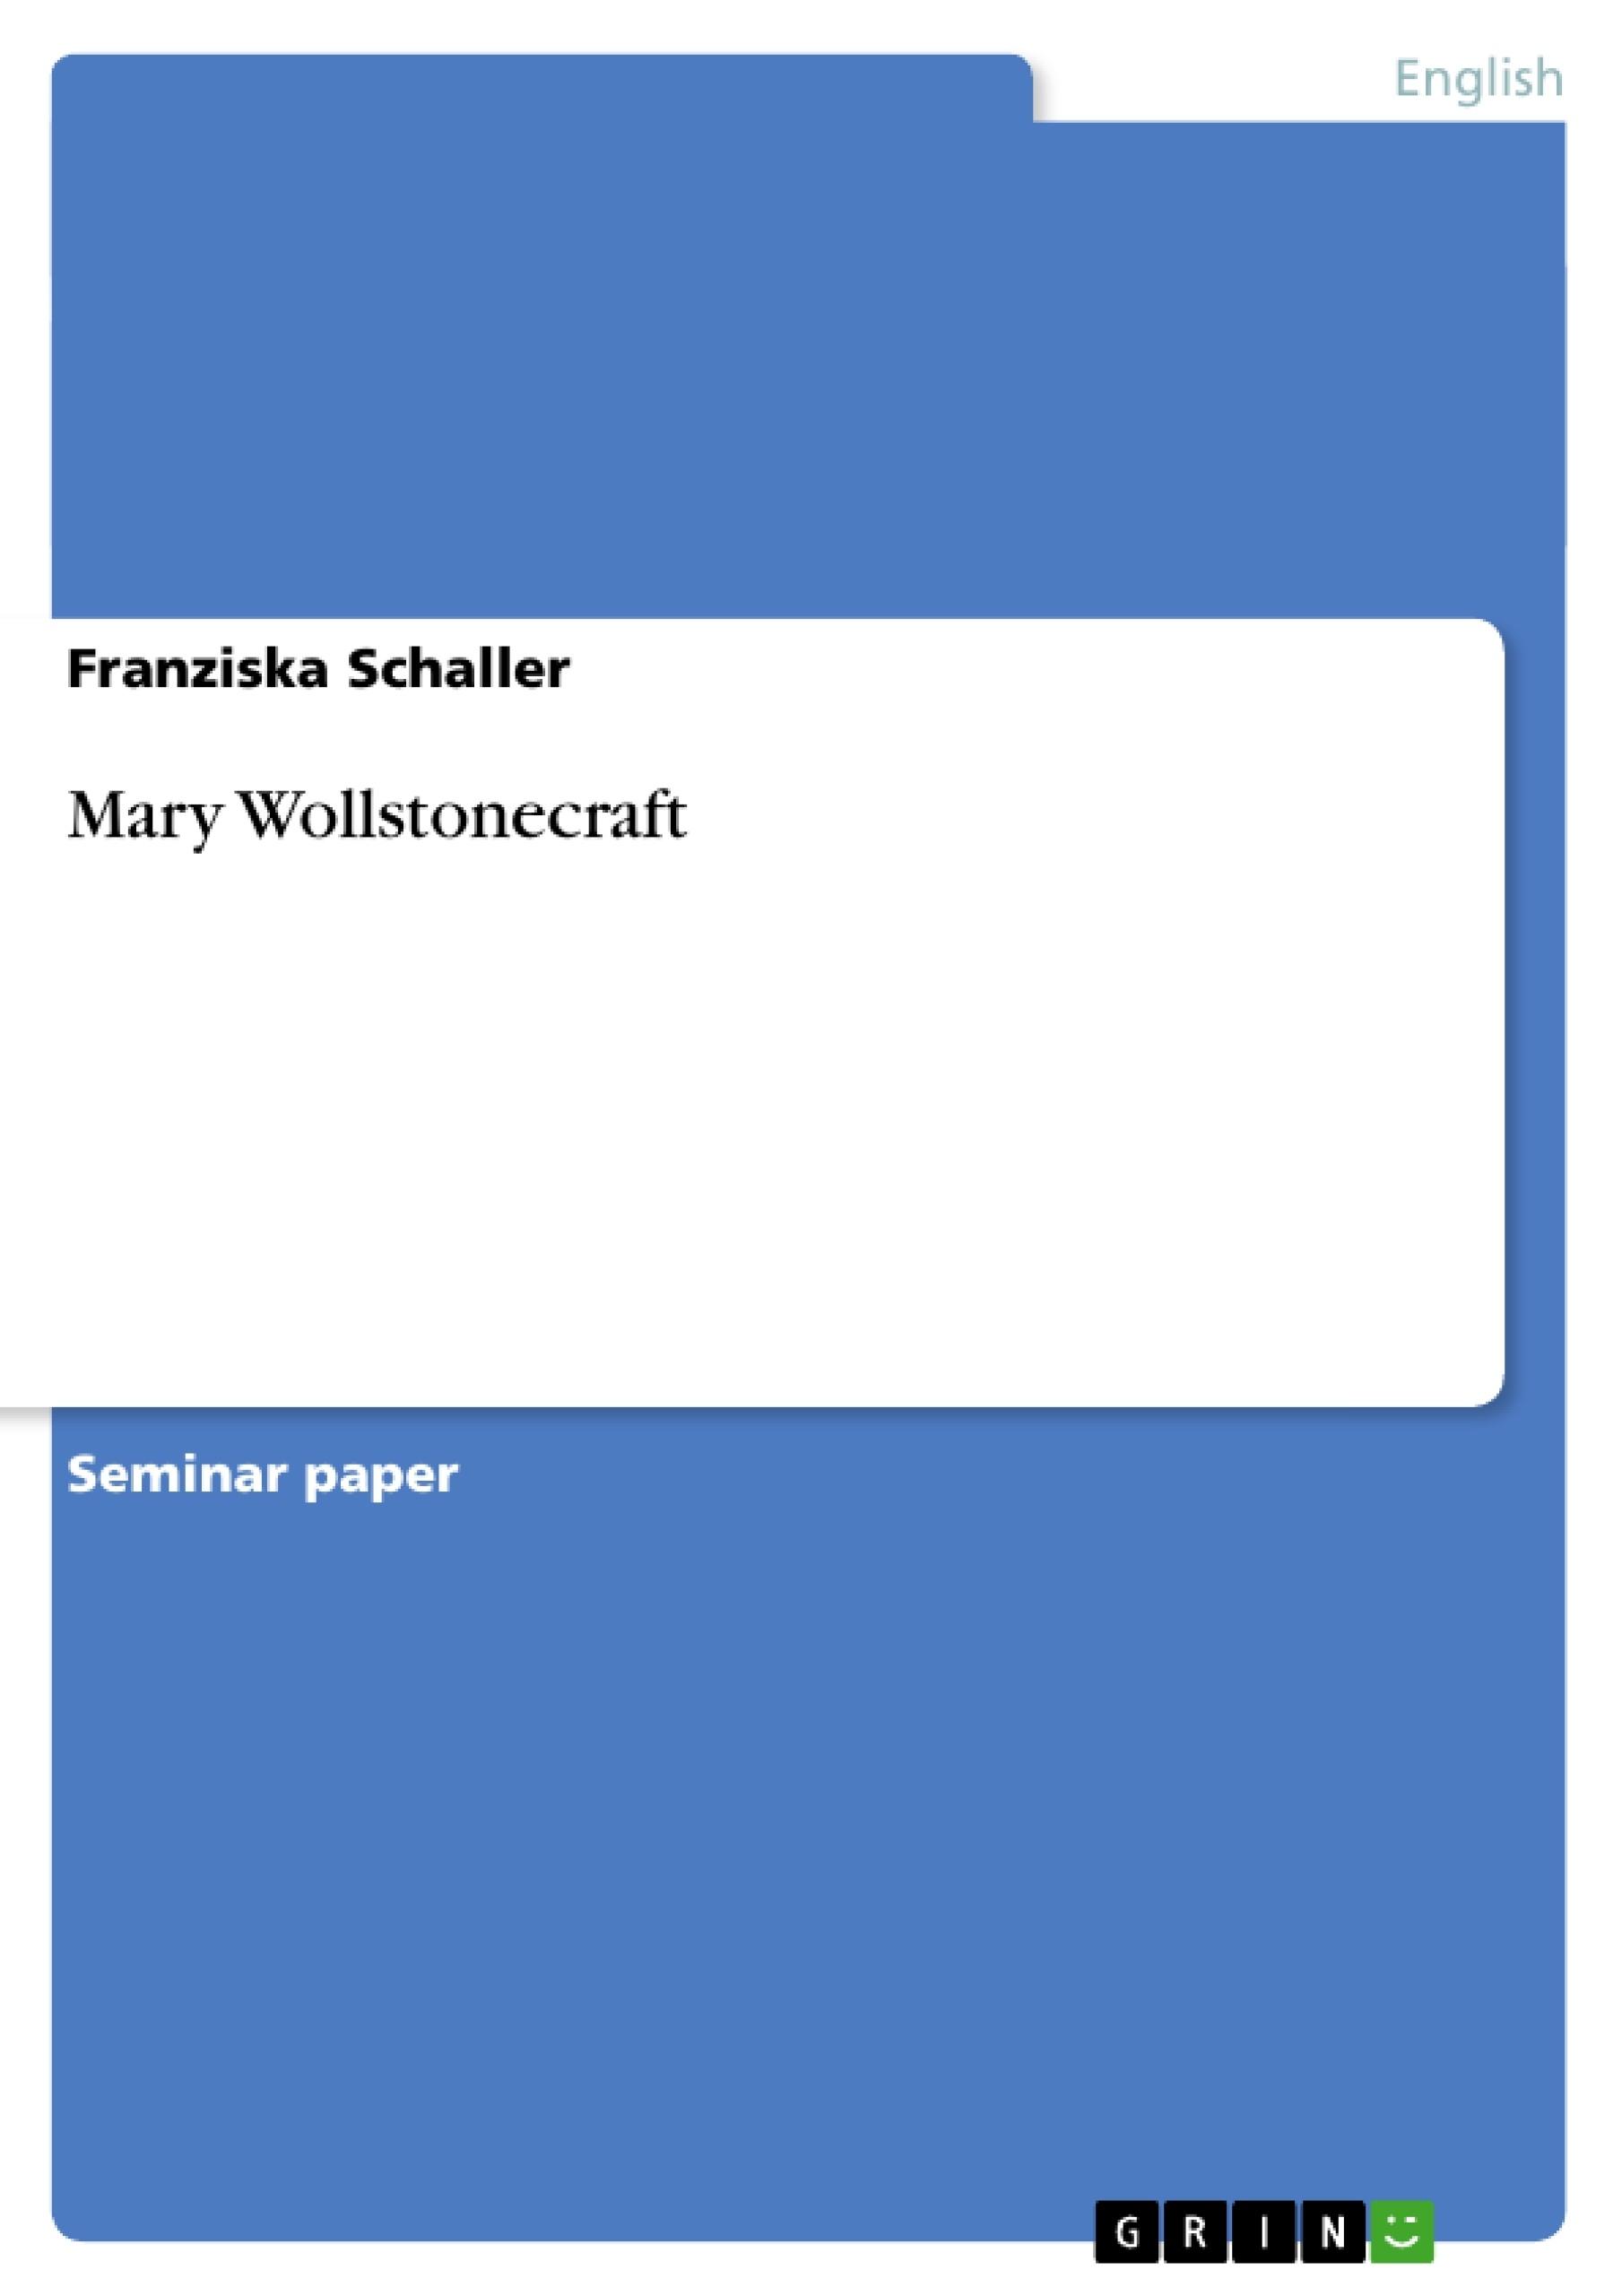 Title: Mary Wollstonecraft